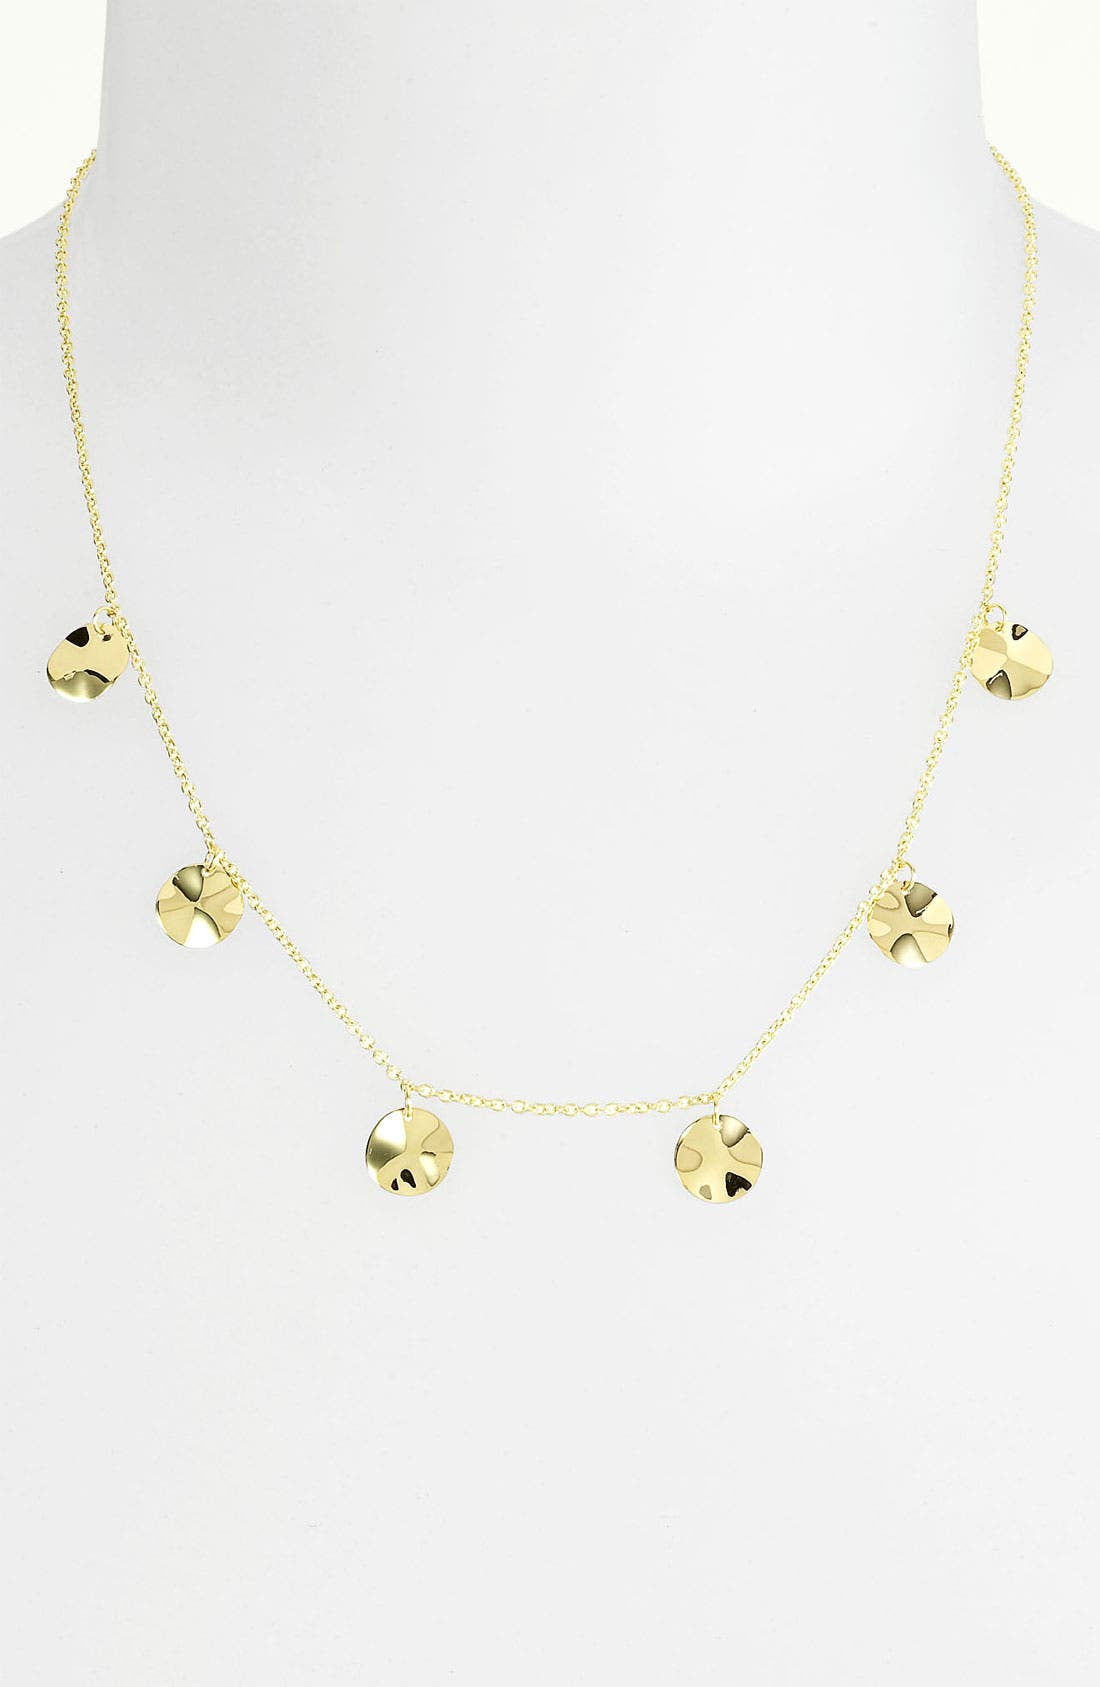 Alternate Image 1 Selected - Ippolita 'Plain' Paillette 18k Gold Necklace